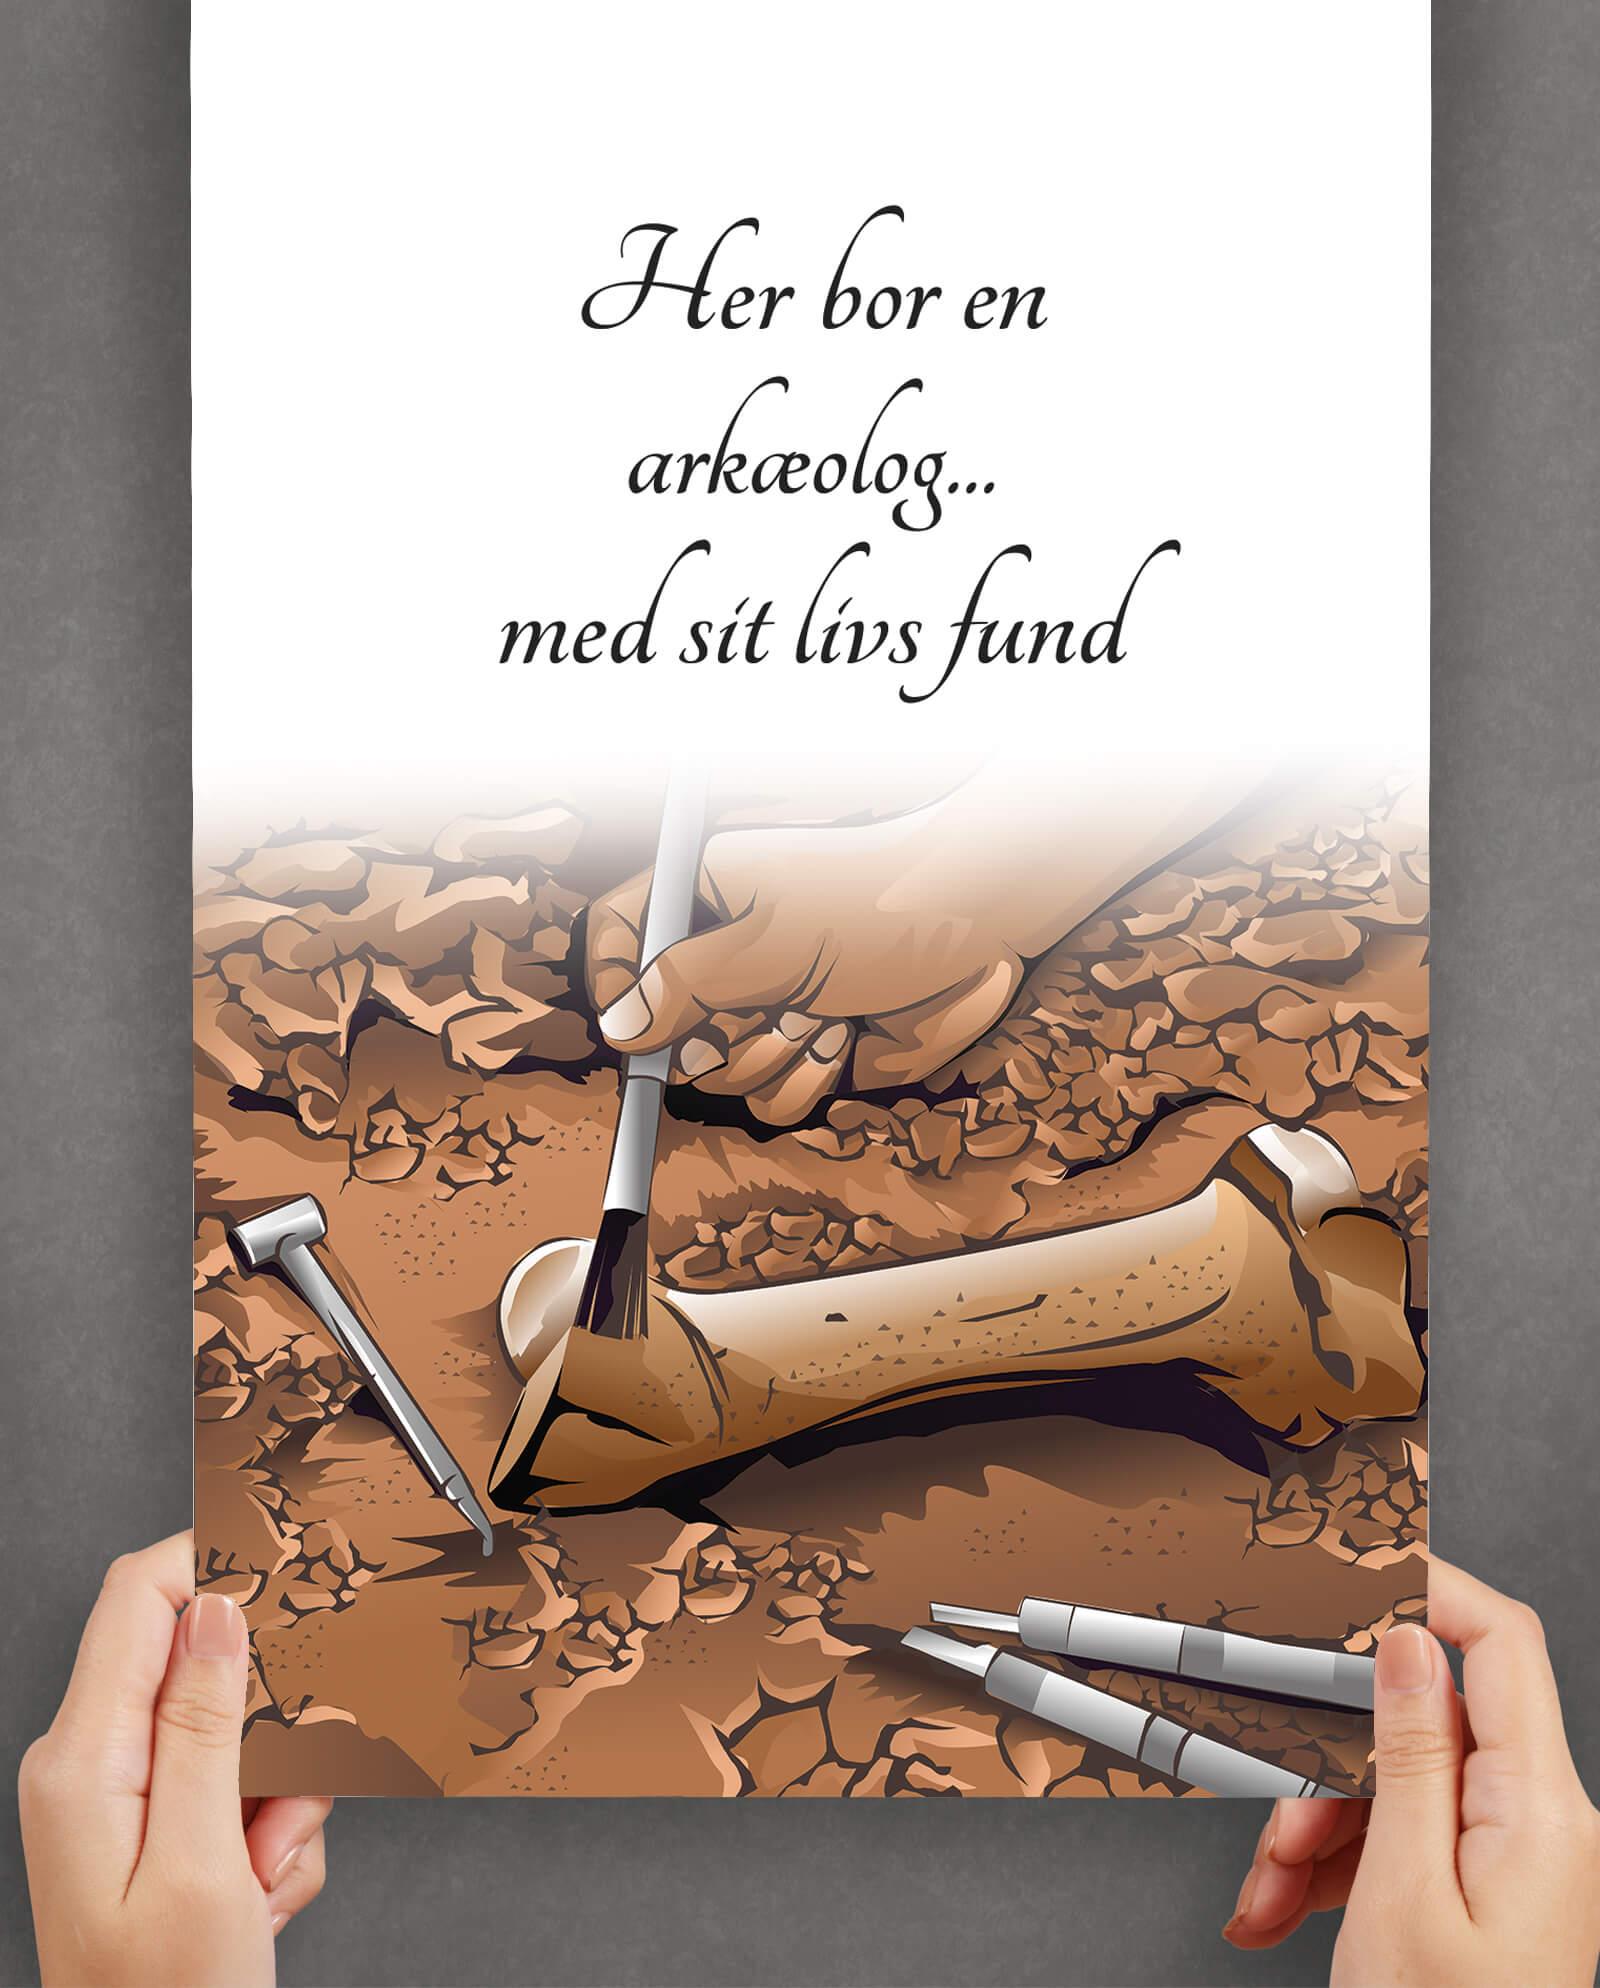 Aerkoeolog-plakat